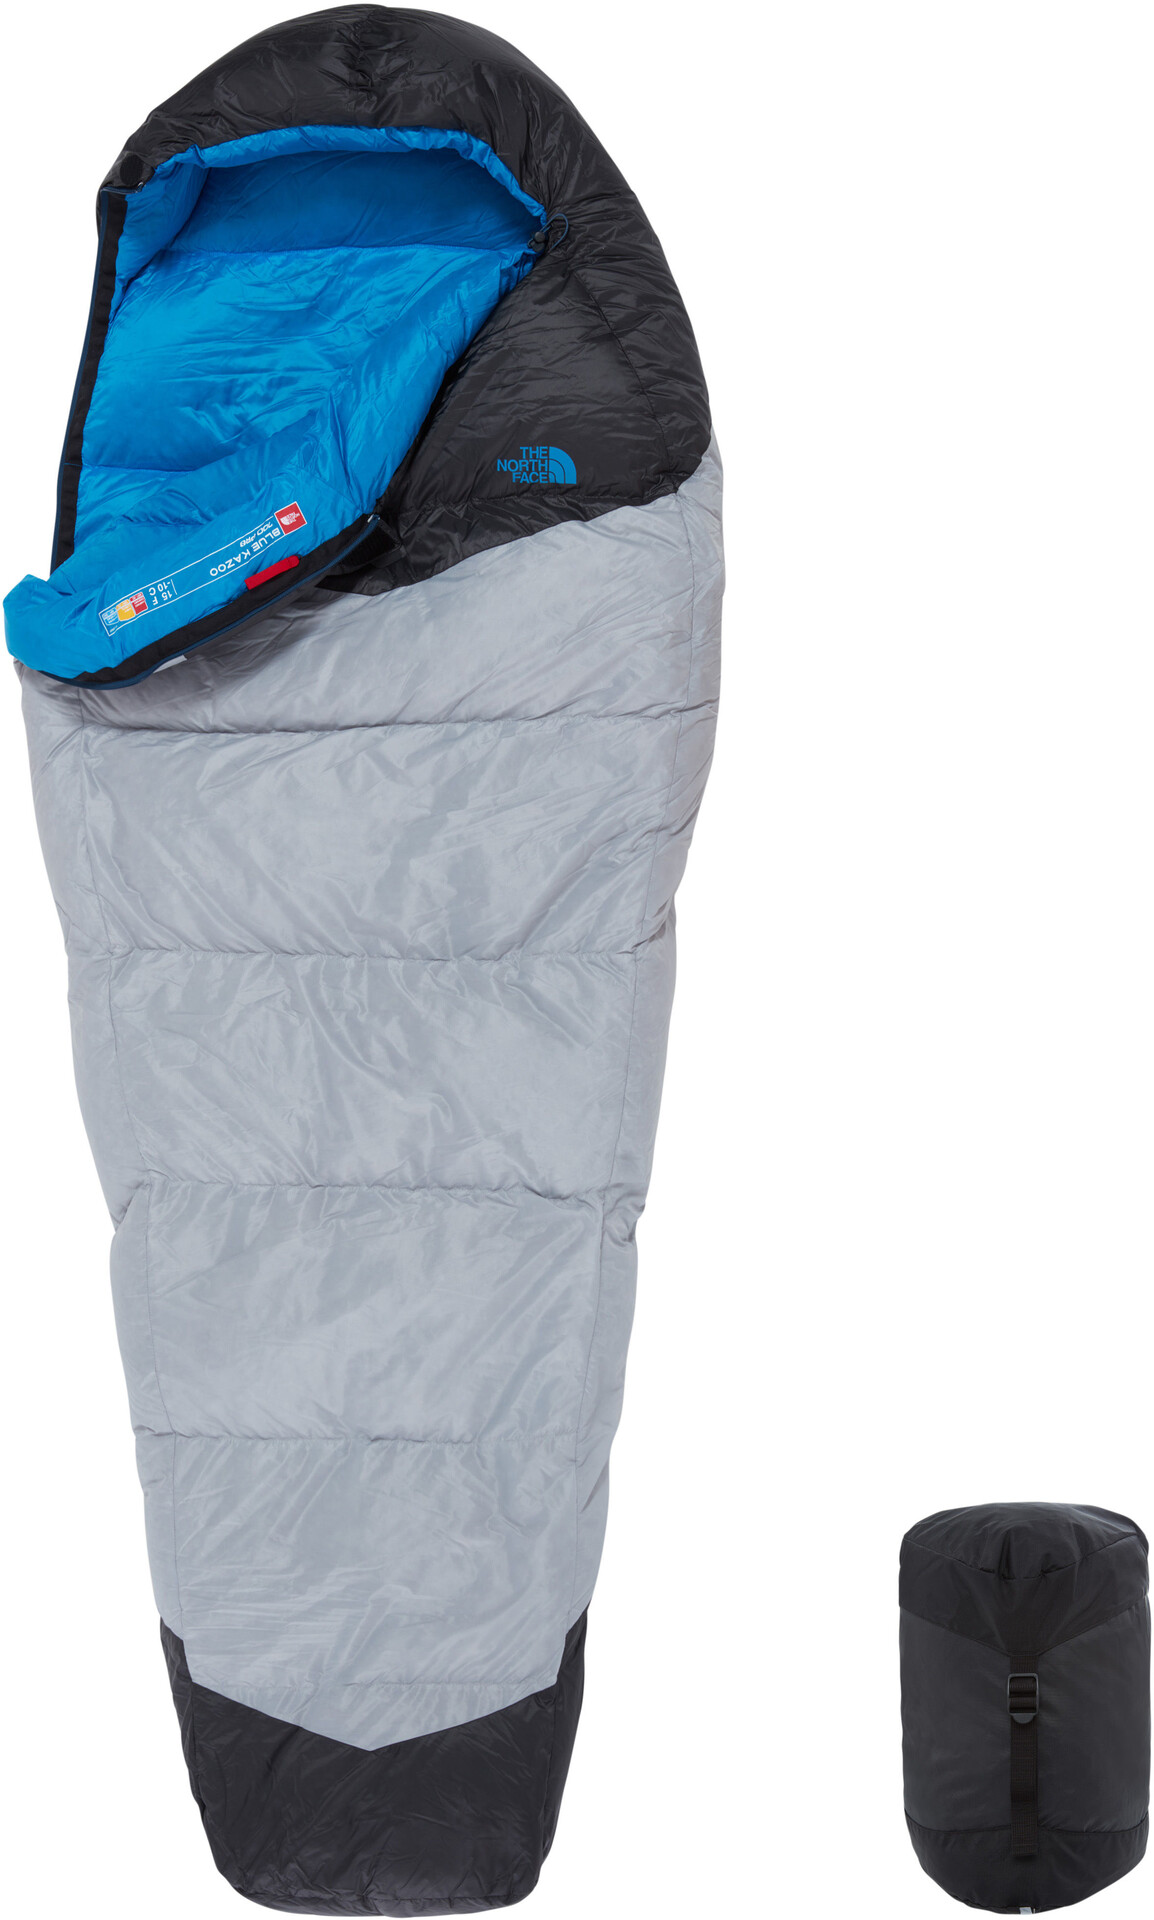 The North Face Blue Kazoo Sac de couchage Normal, high rise greyhyper blue